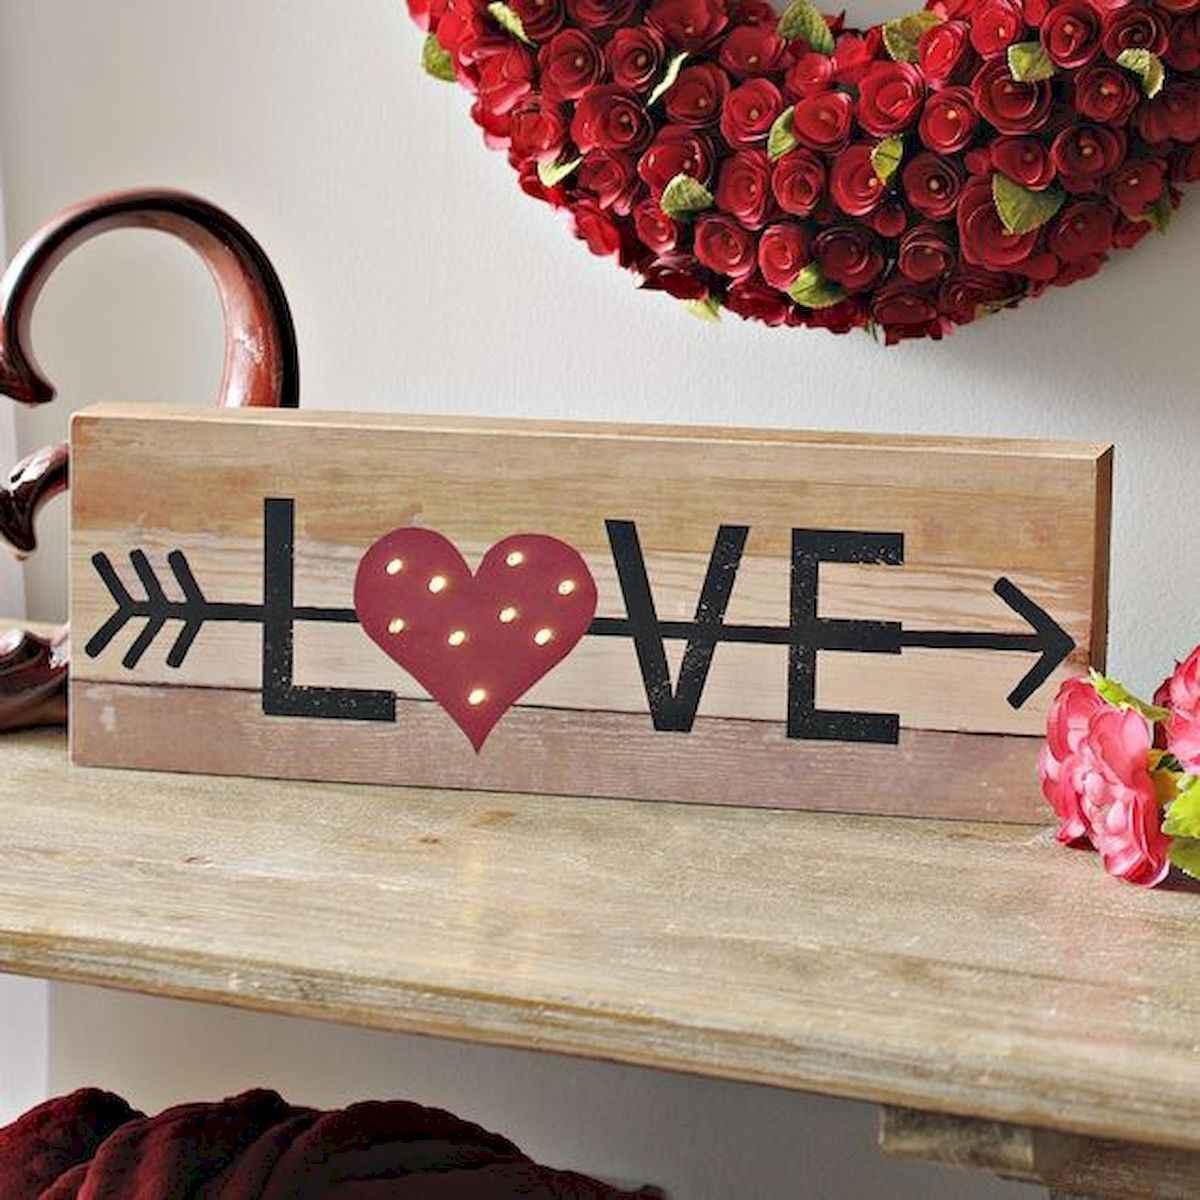 75 lovely valentines day crafts design ideas (38)